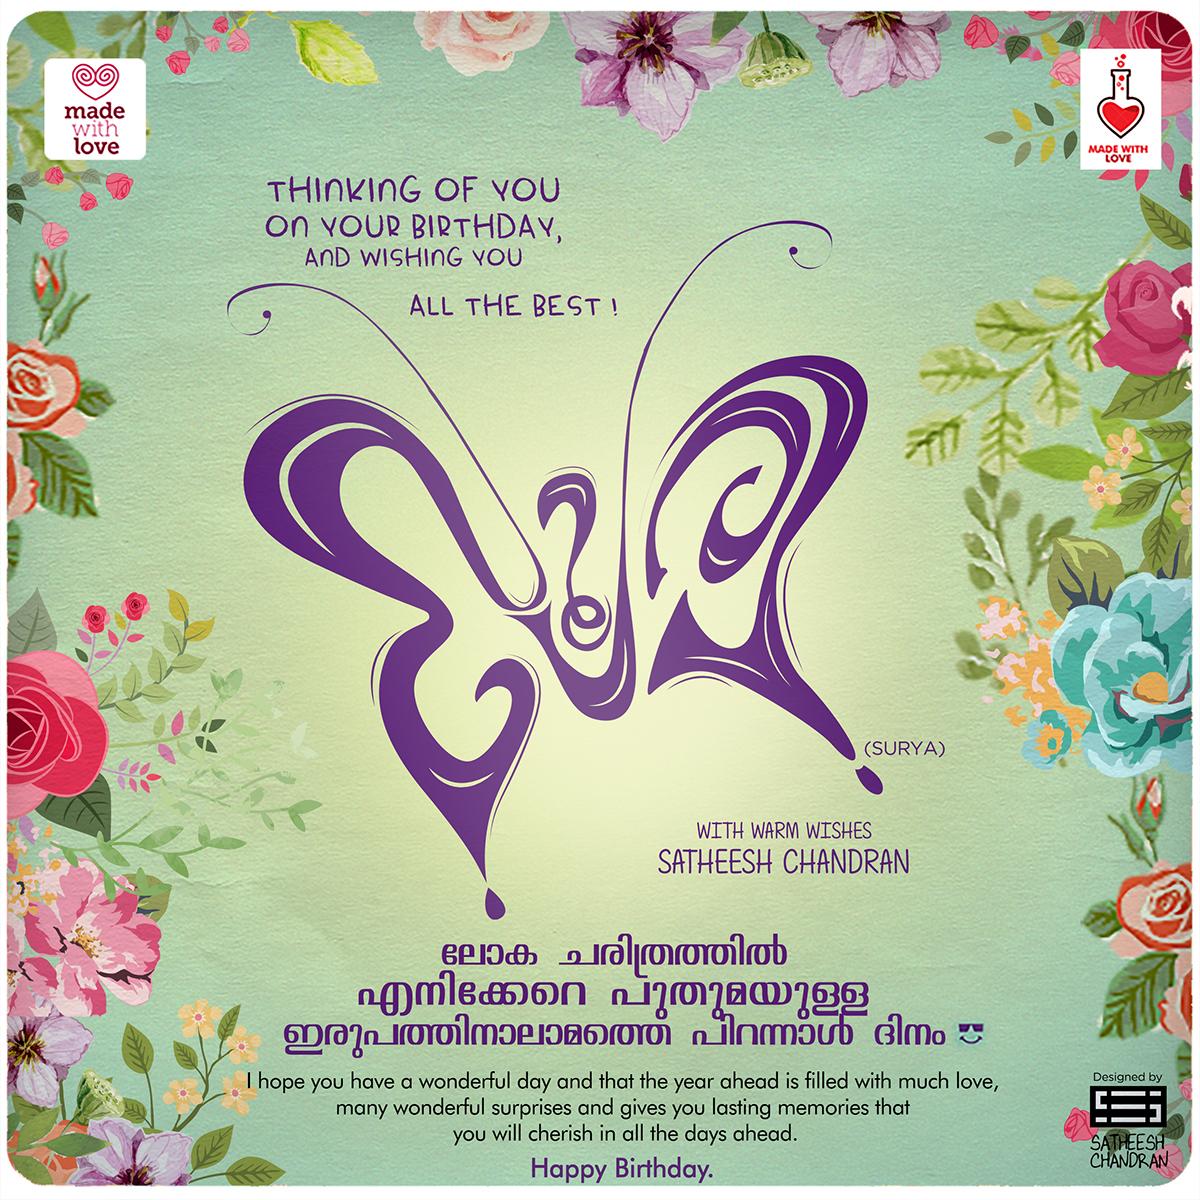 malayalam Premam Birthday poster triplicate surya watercolor typo Calligraphy